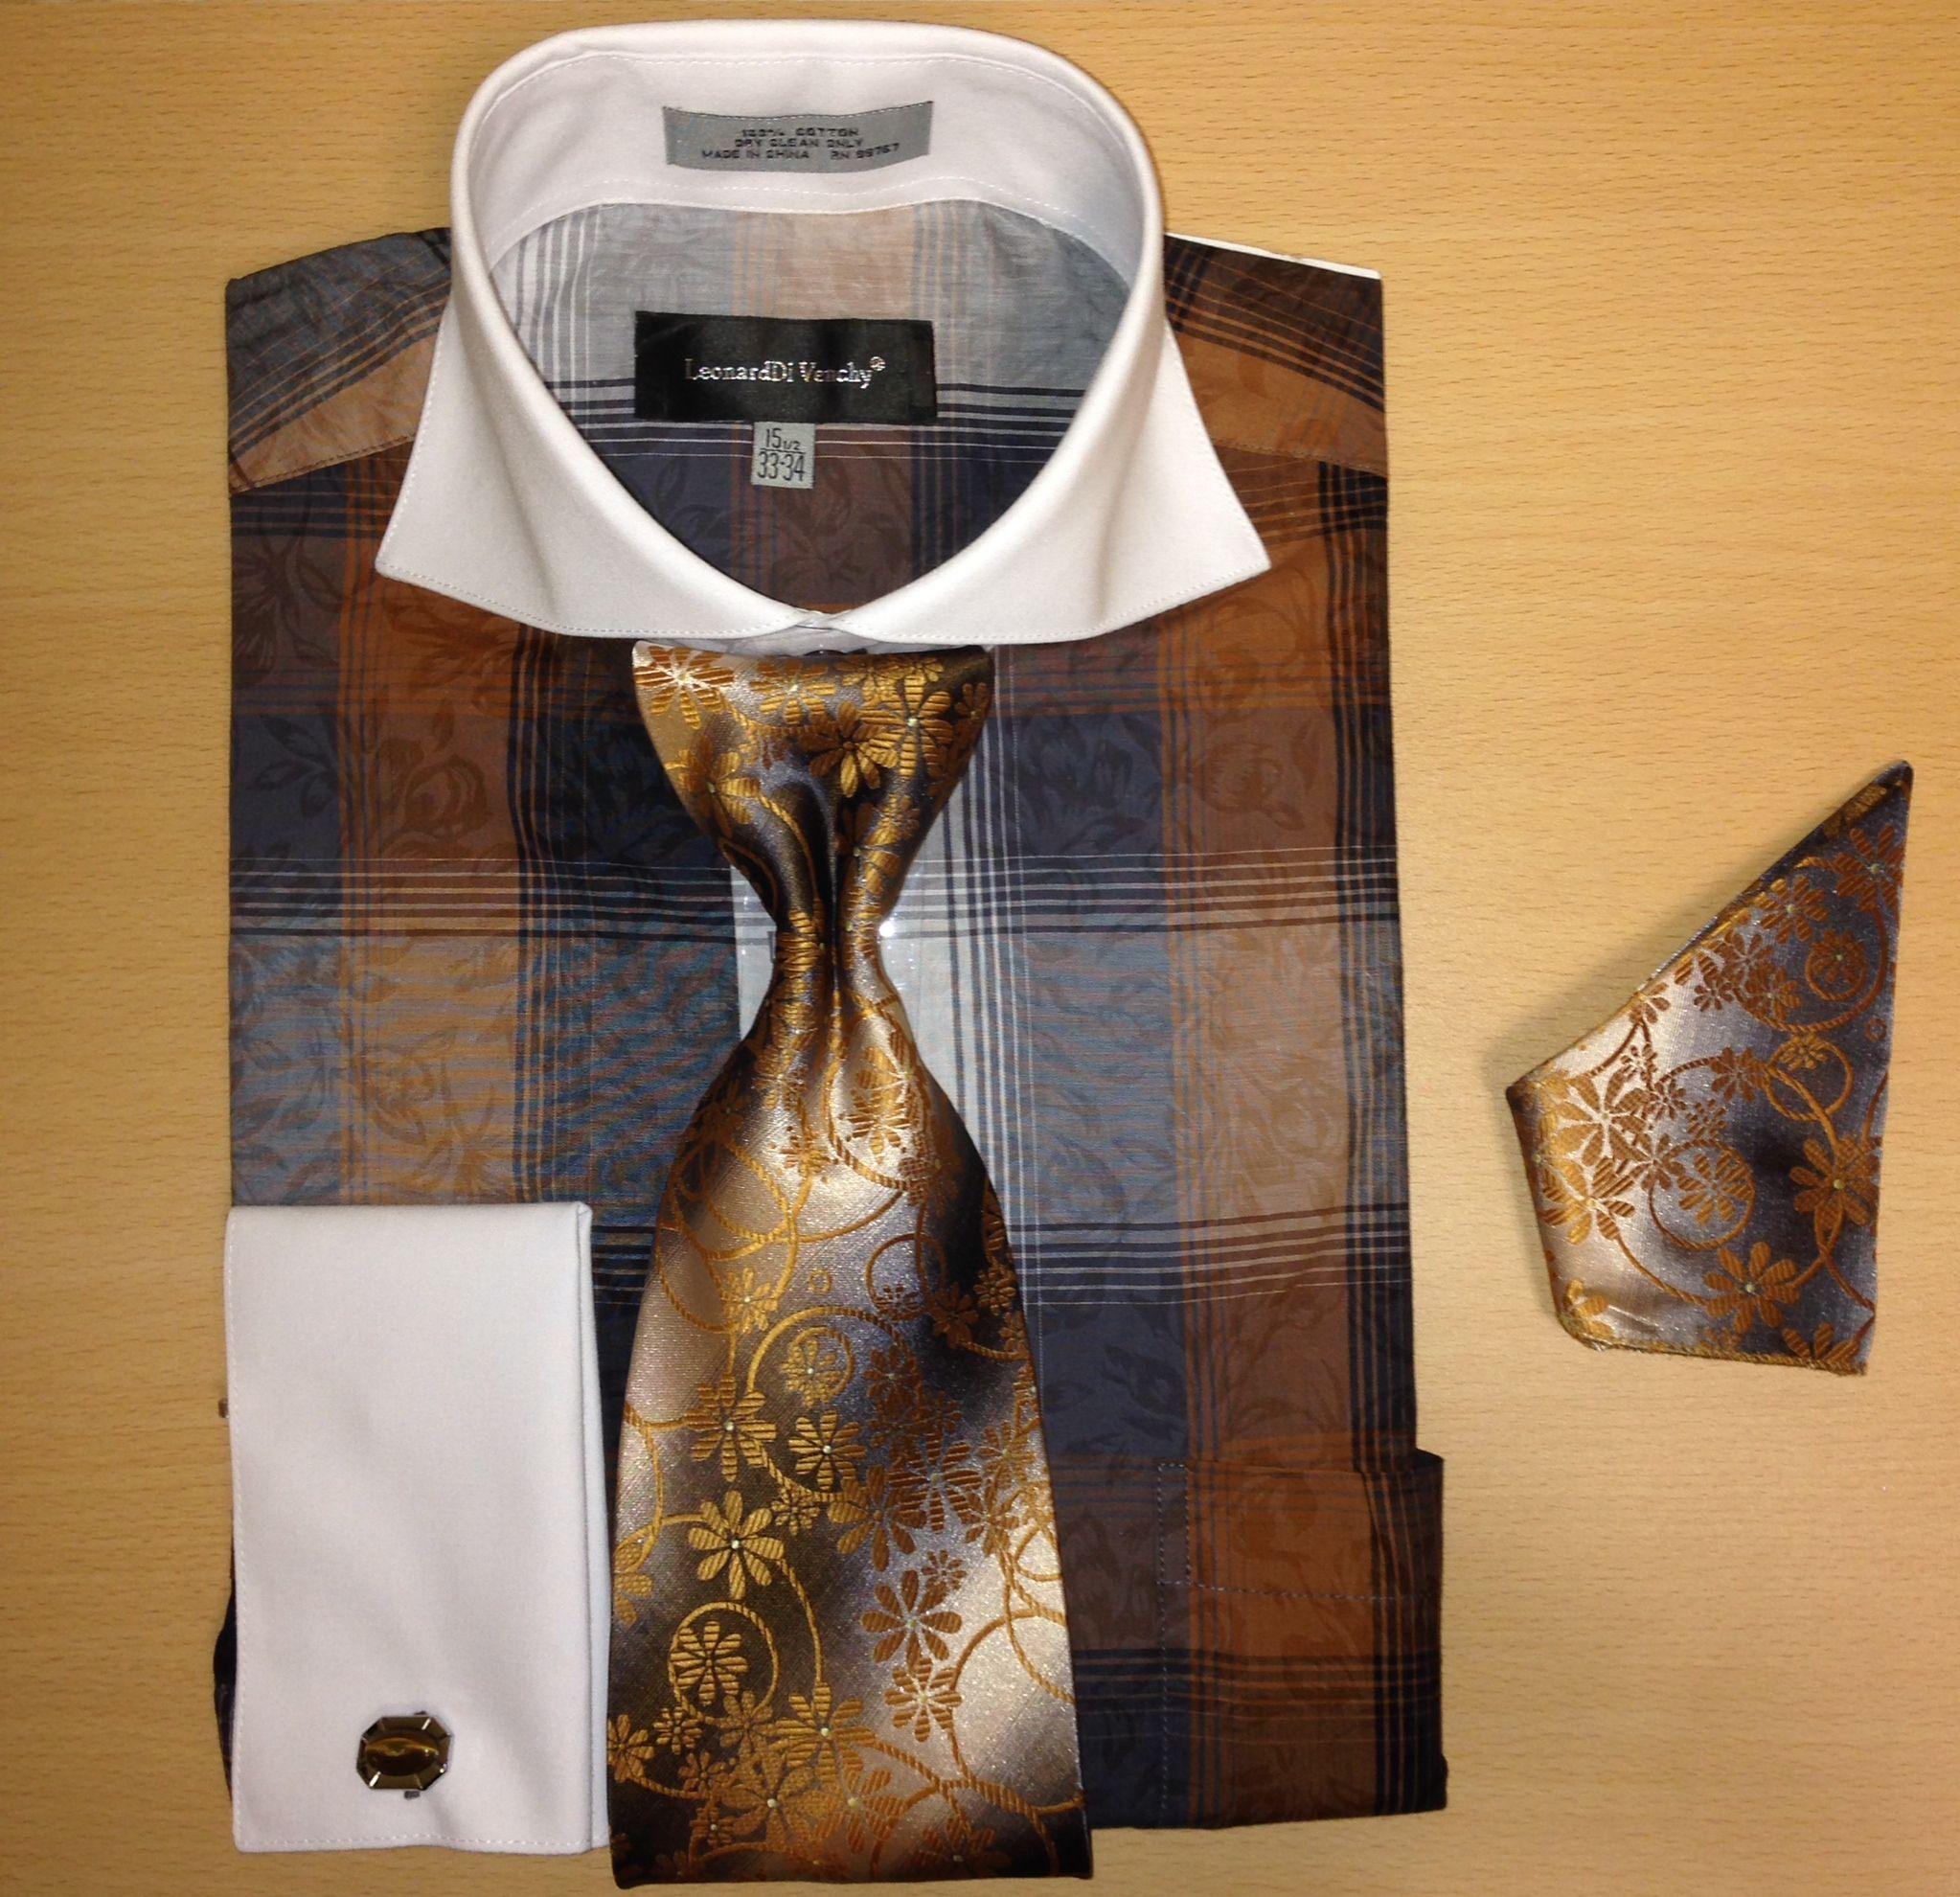 Men's Fashion Two-Tone w/ Paisley Mixture Cufflink Dress Shirt Set - Brown to Black